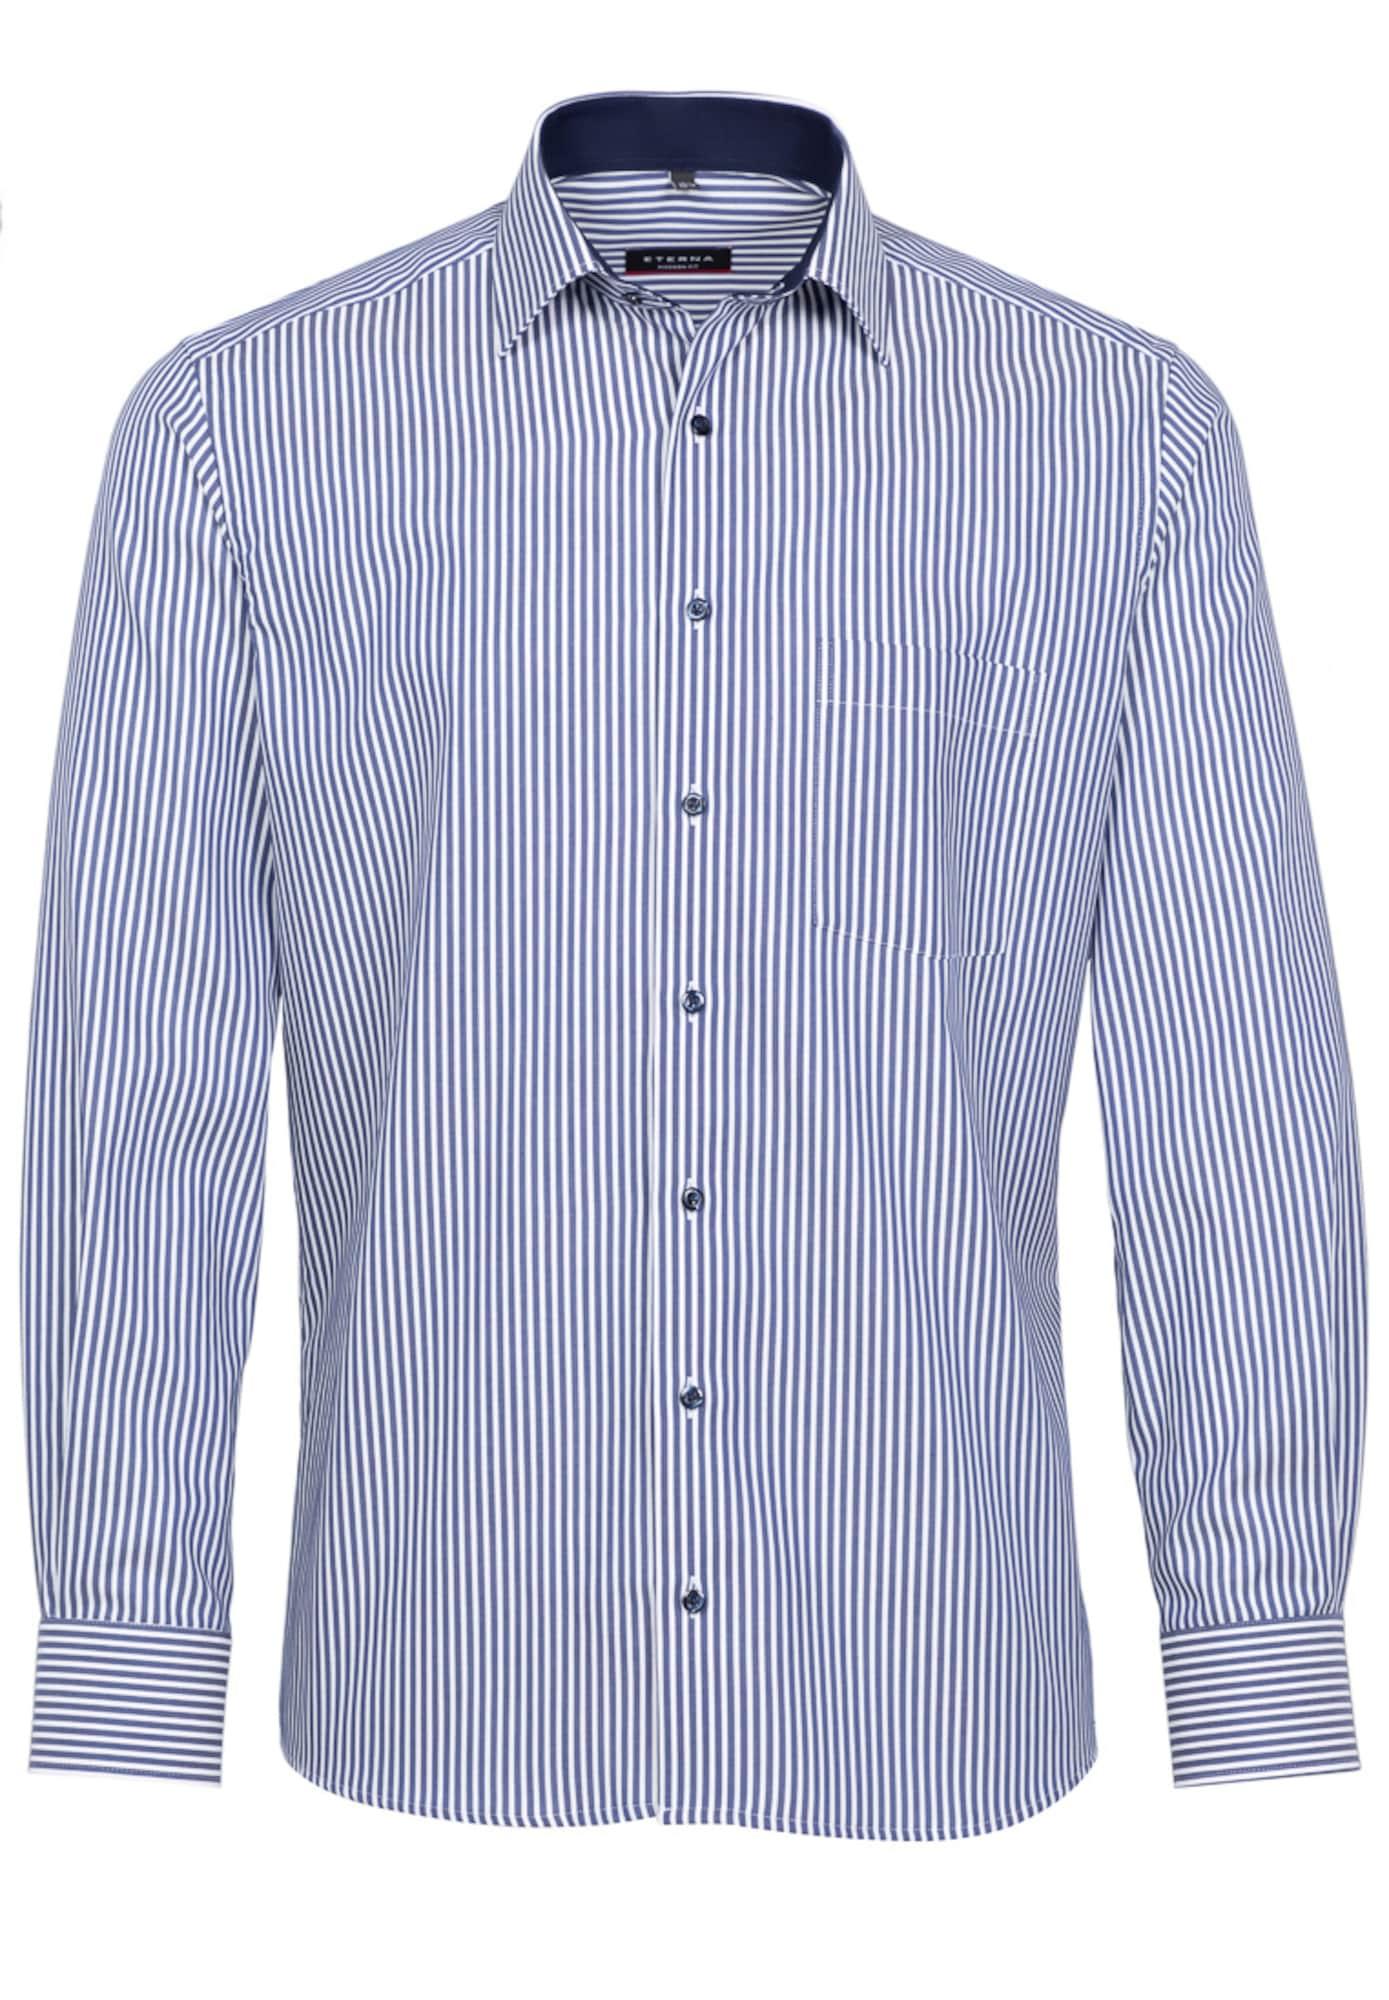 ETERNA Marškiniai mėlyna / balta